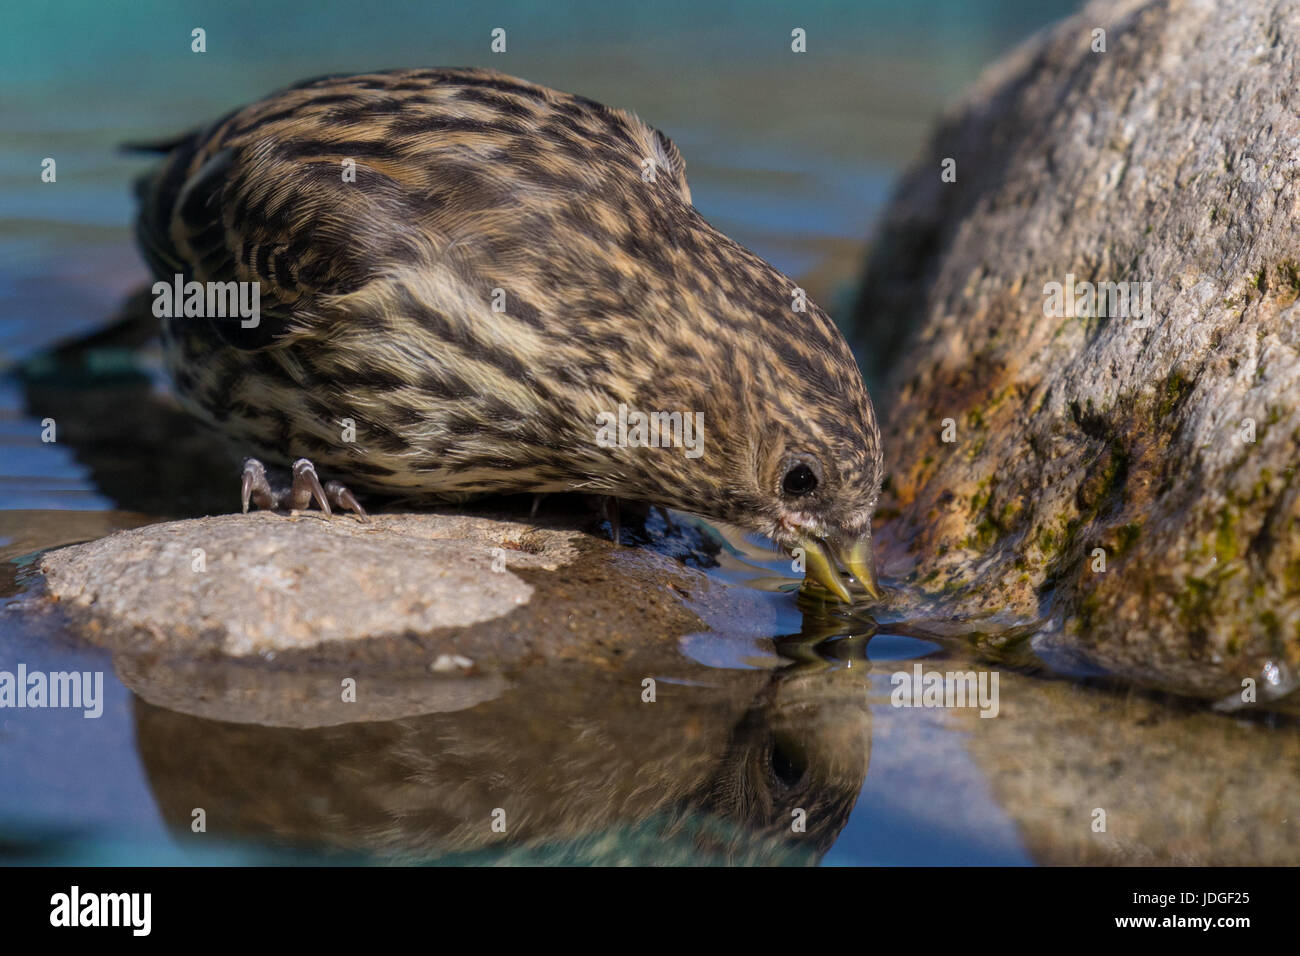 pine siskin a small type of finch visits a backyard bird bath